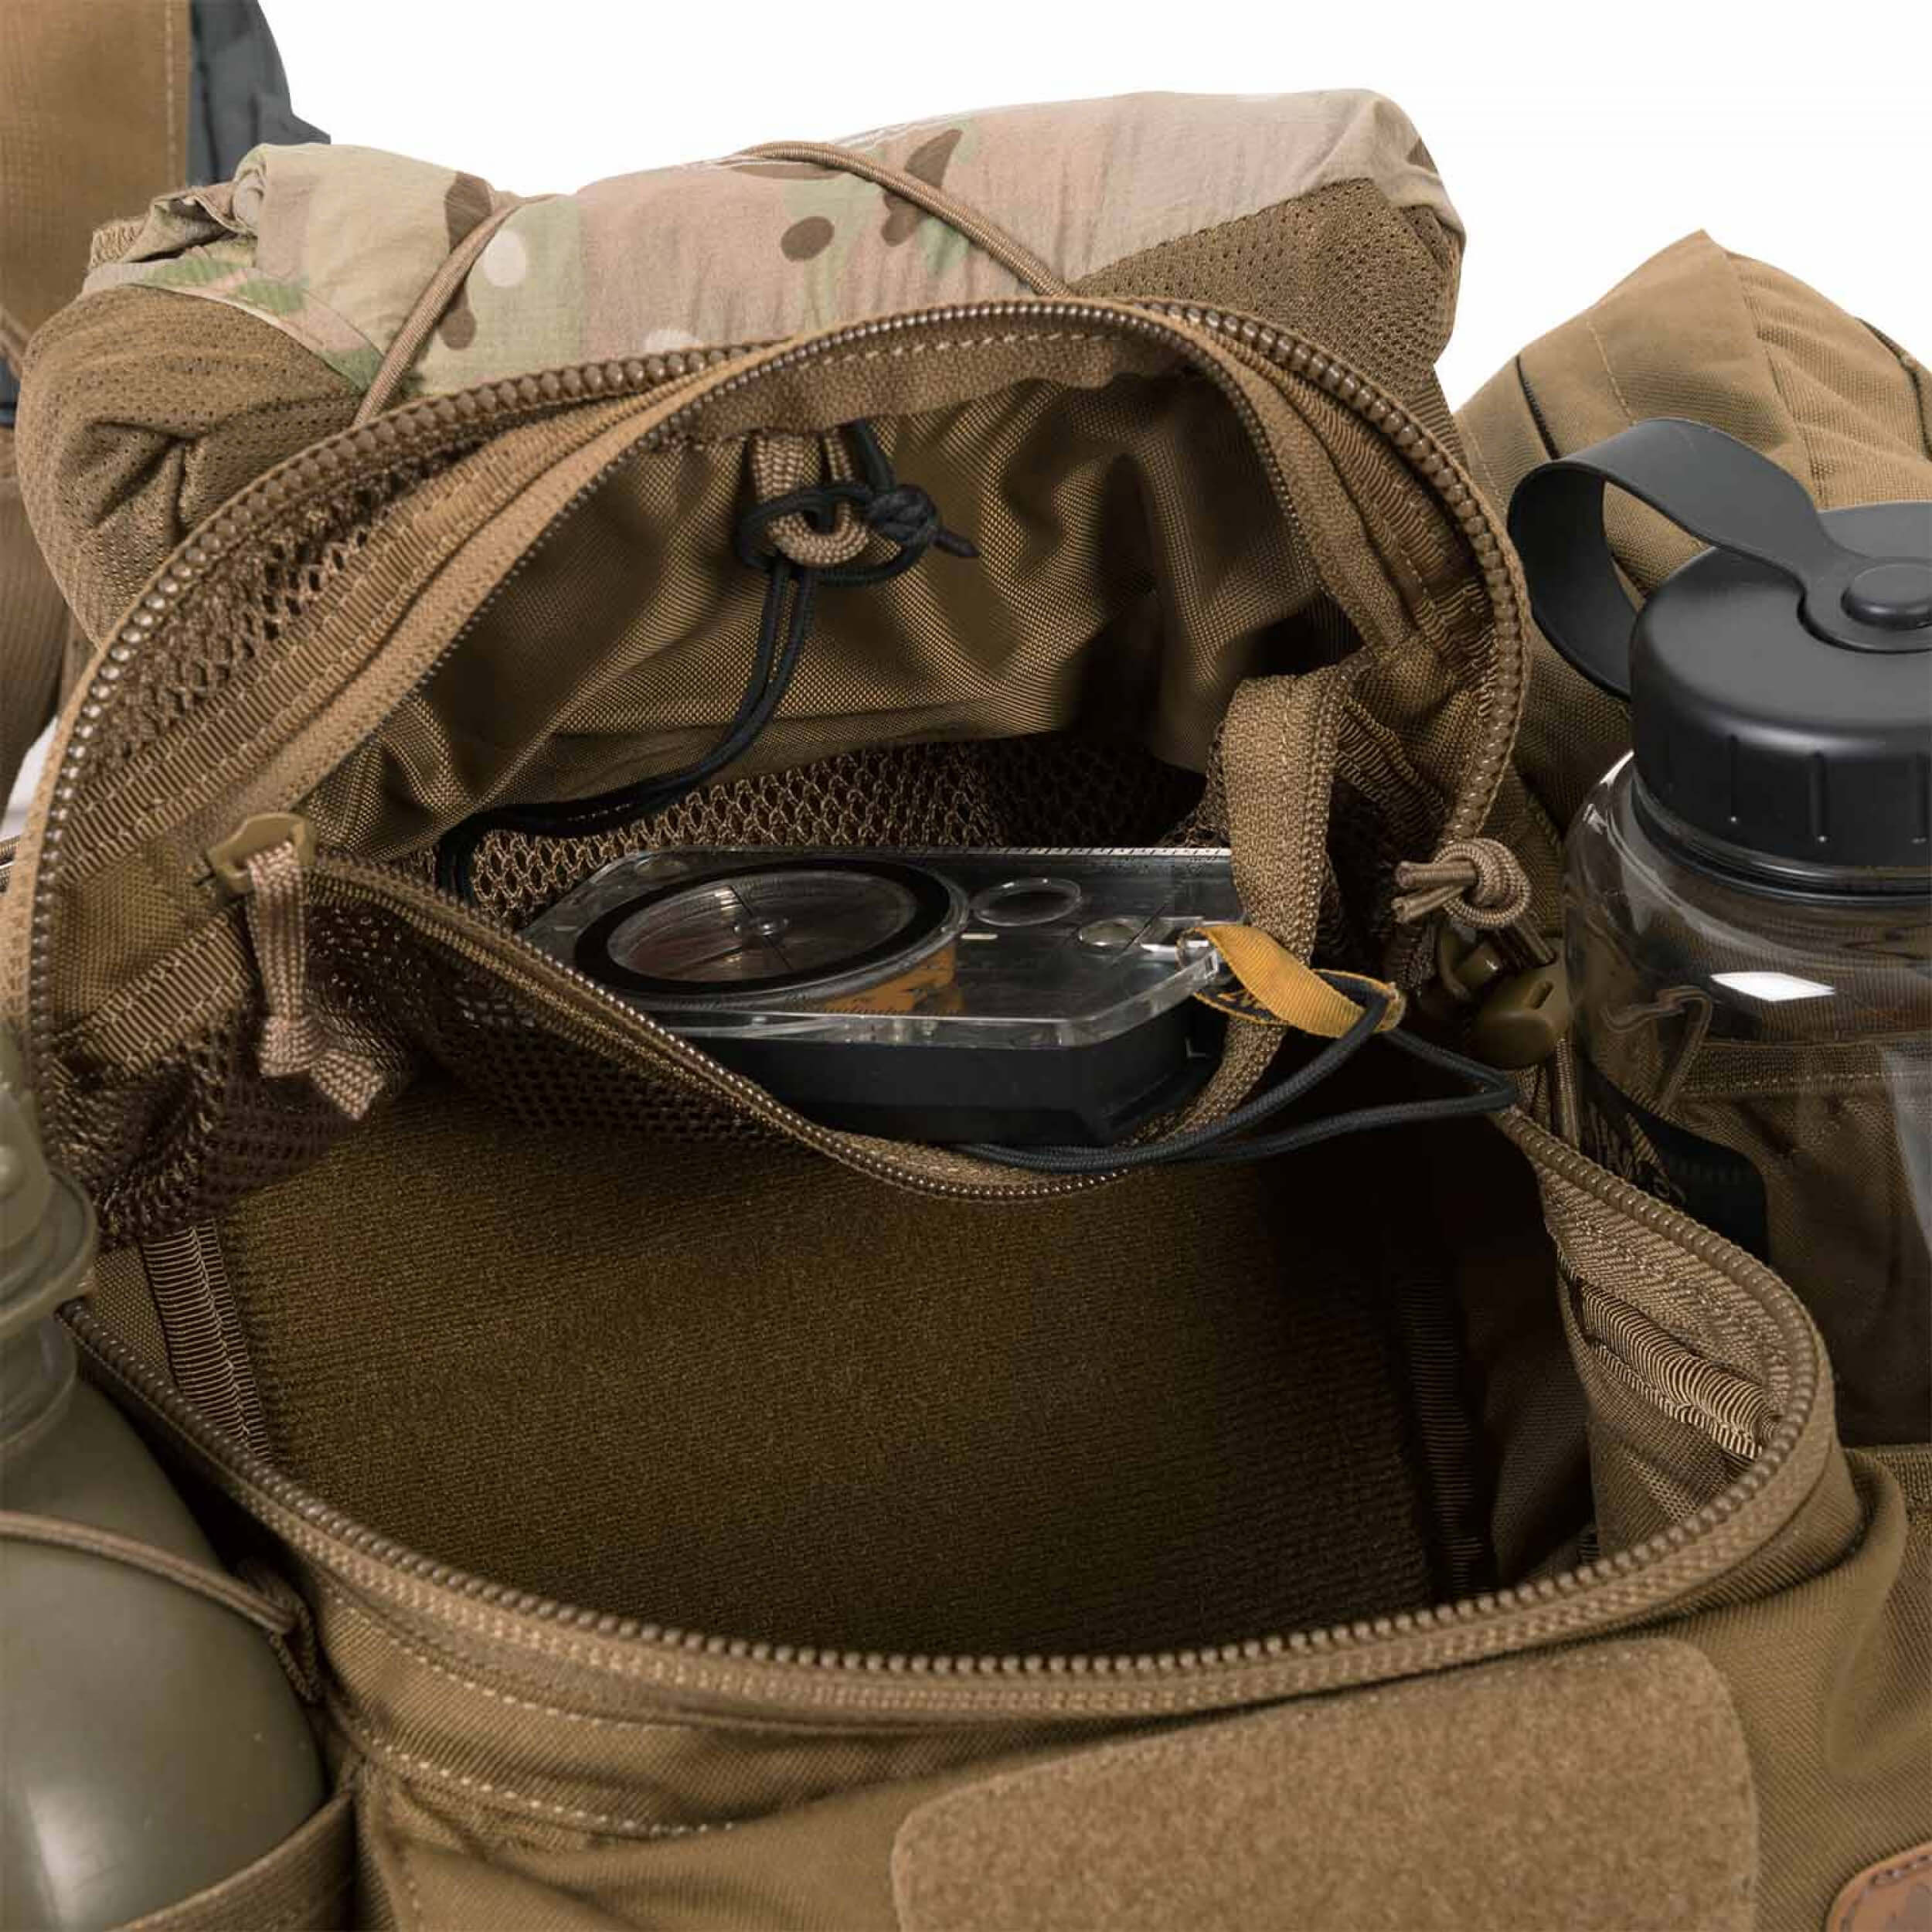 Helikon-Tex Foxtrot MKII Belt Rig - Cordura - Coyote